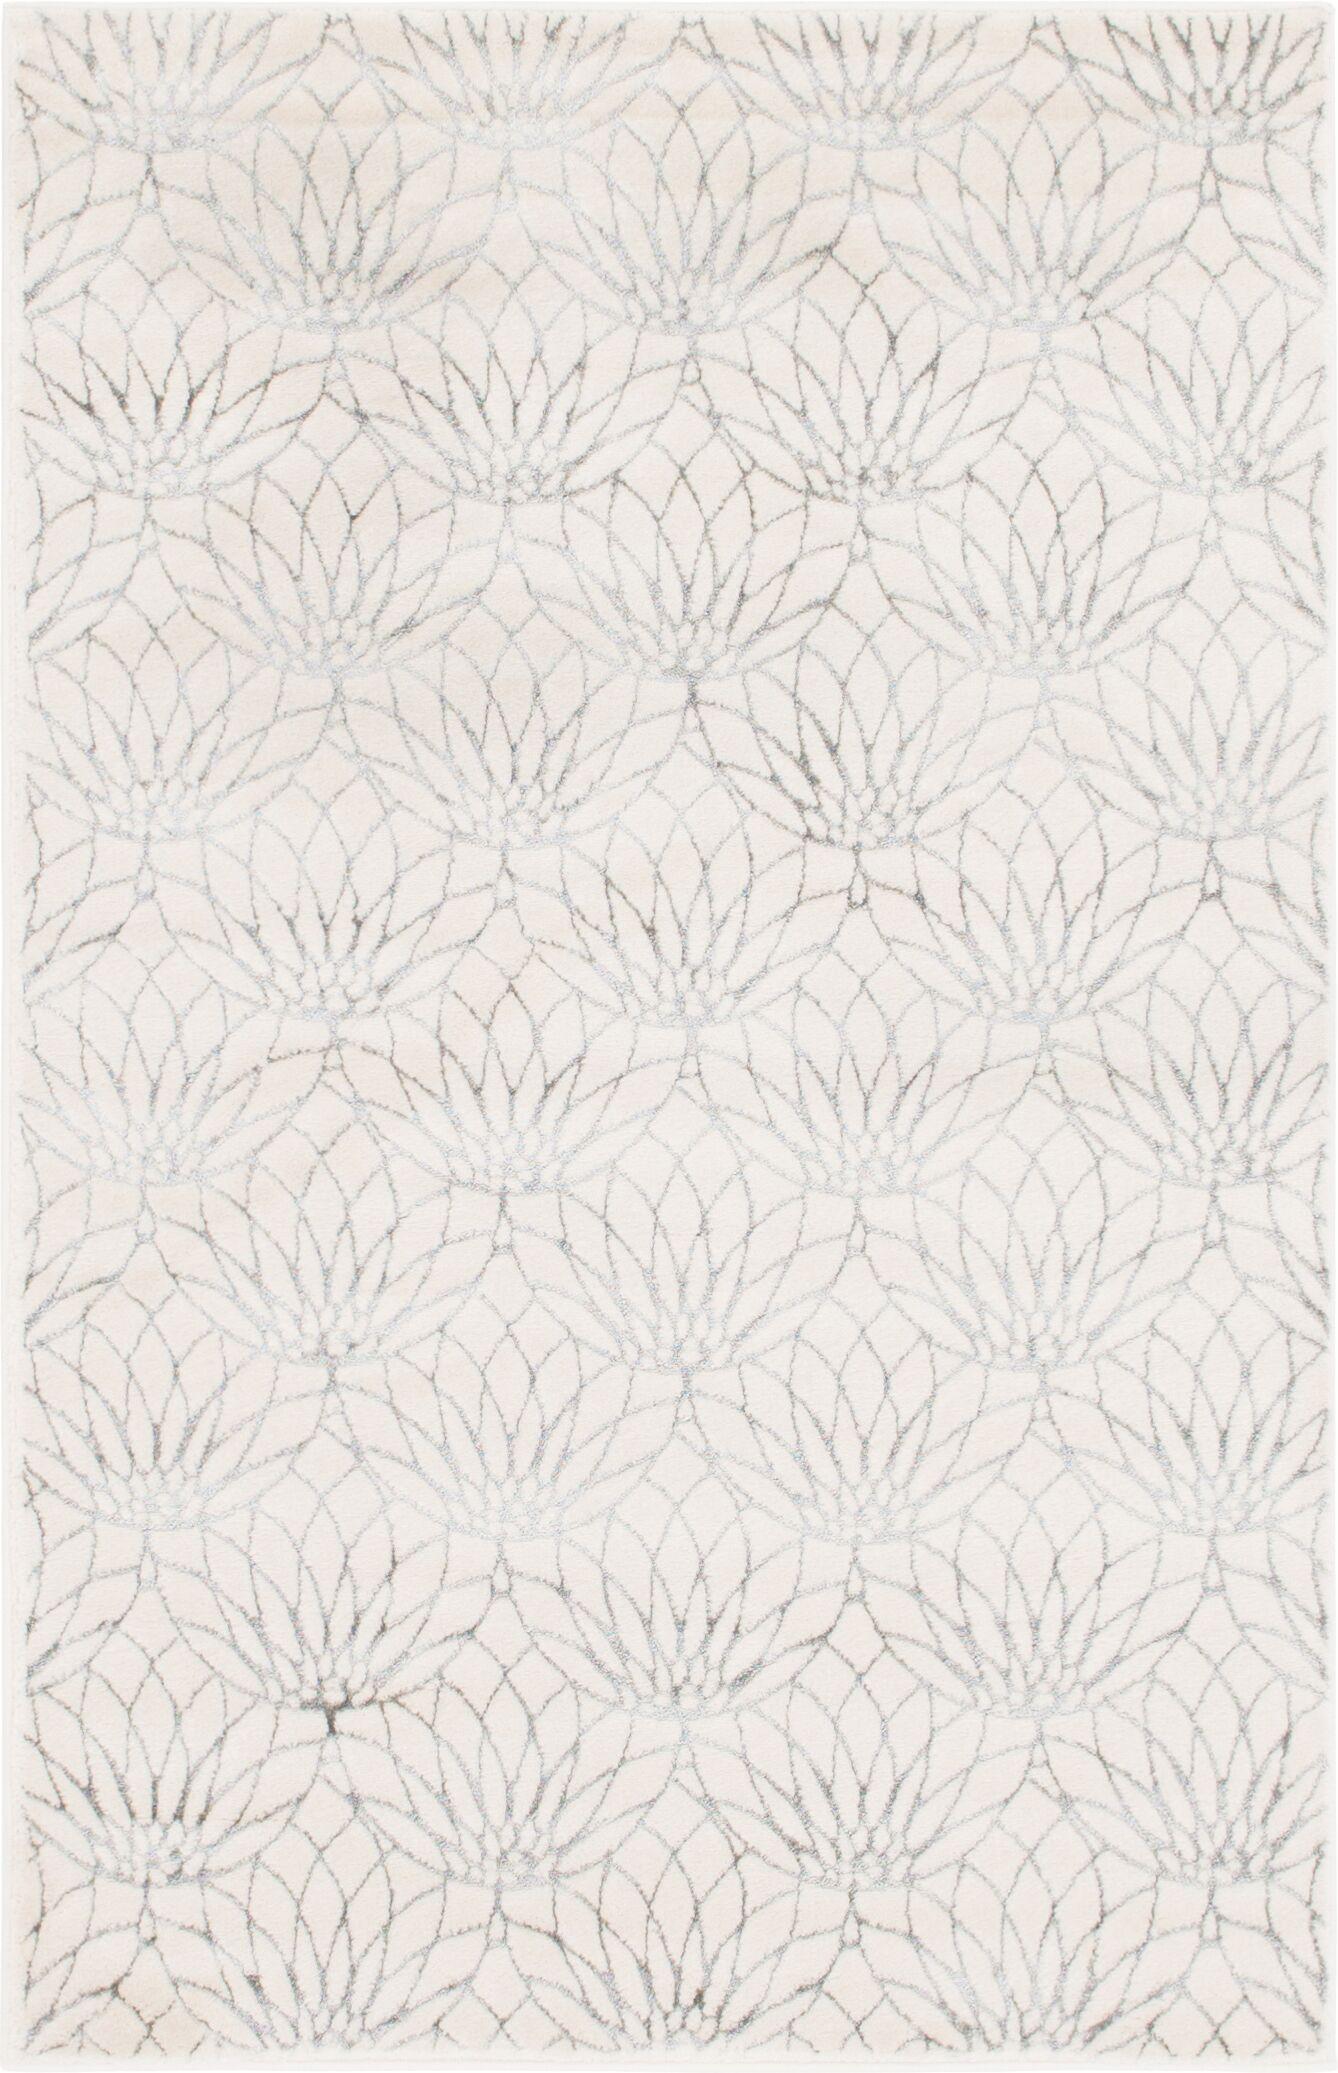 Glam Ivory Area Rug Rug Size: Rectangle 4' x 6'